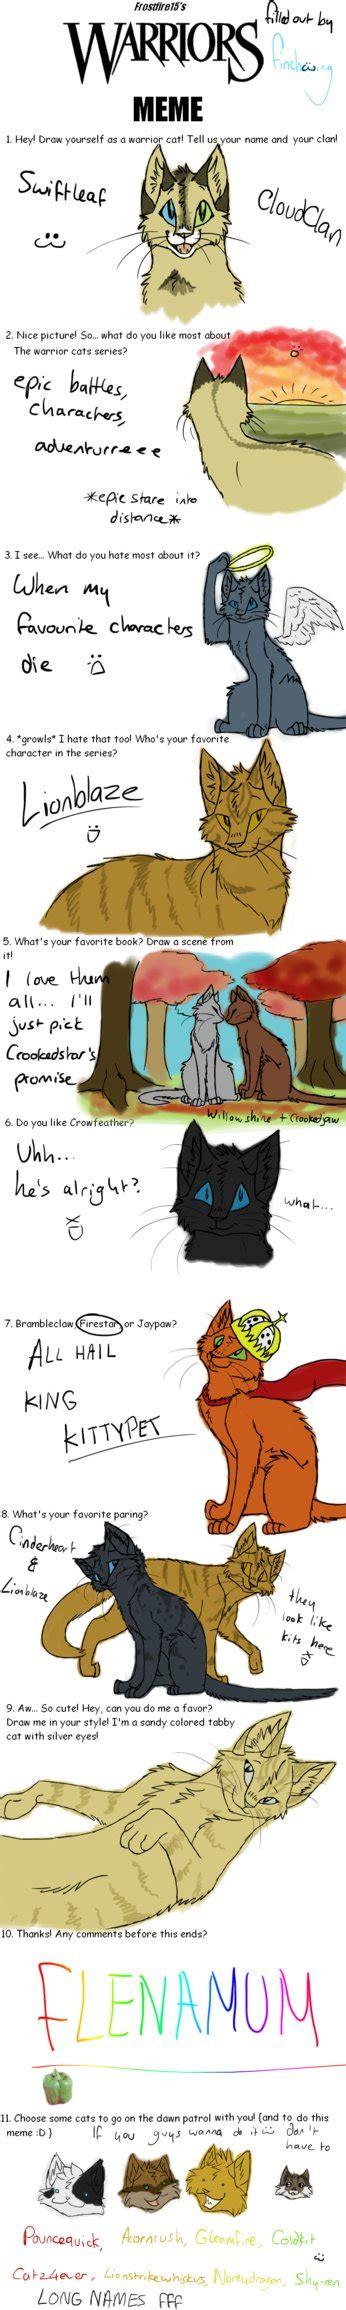 Warrior Cats Memes - warrior cats meme 6 12 11 by finchwing on deviantart